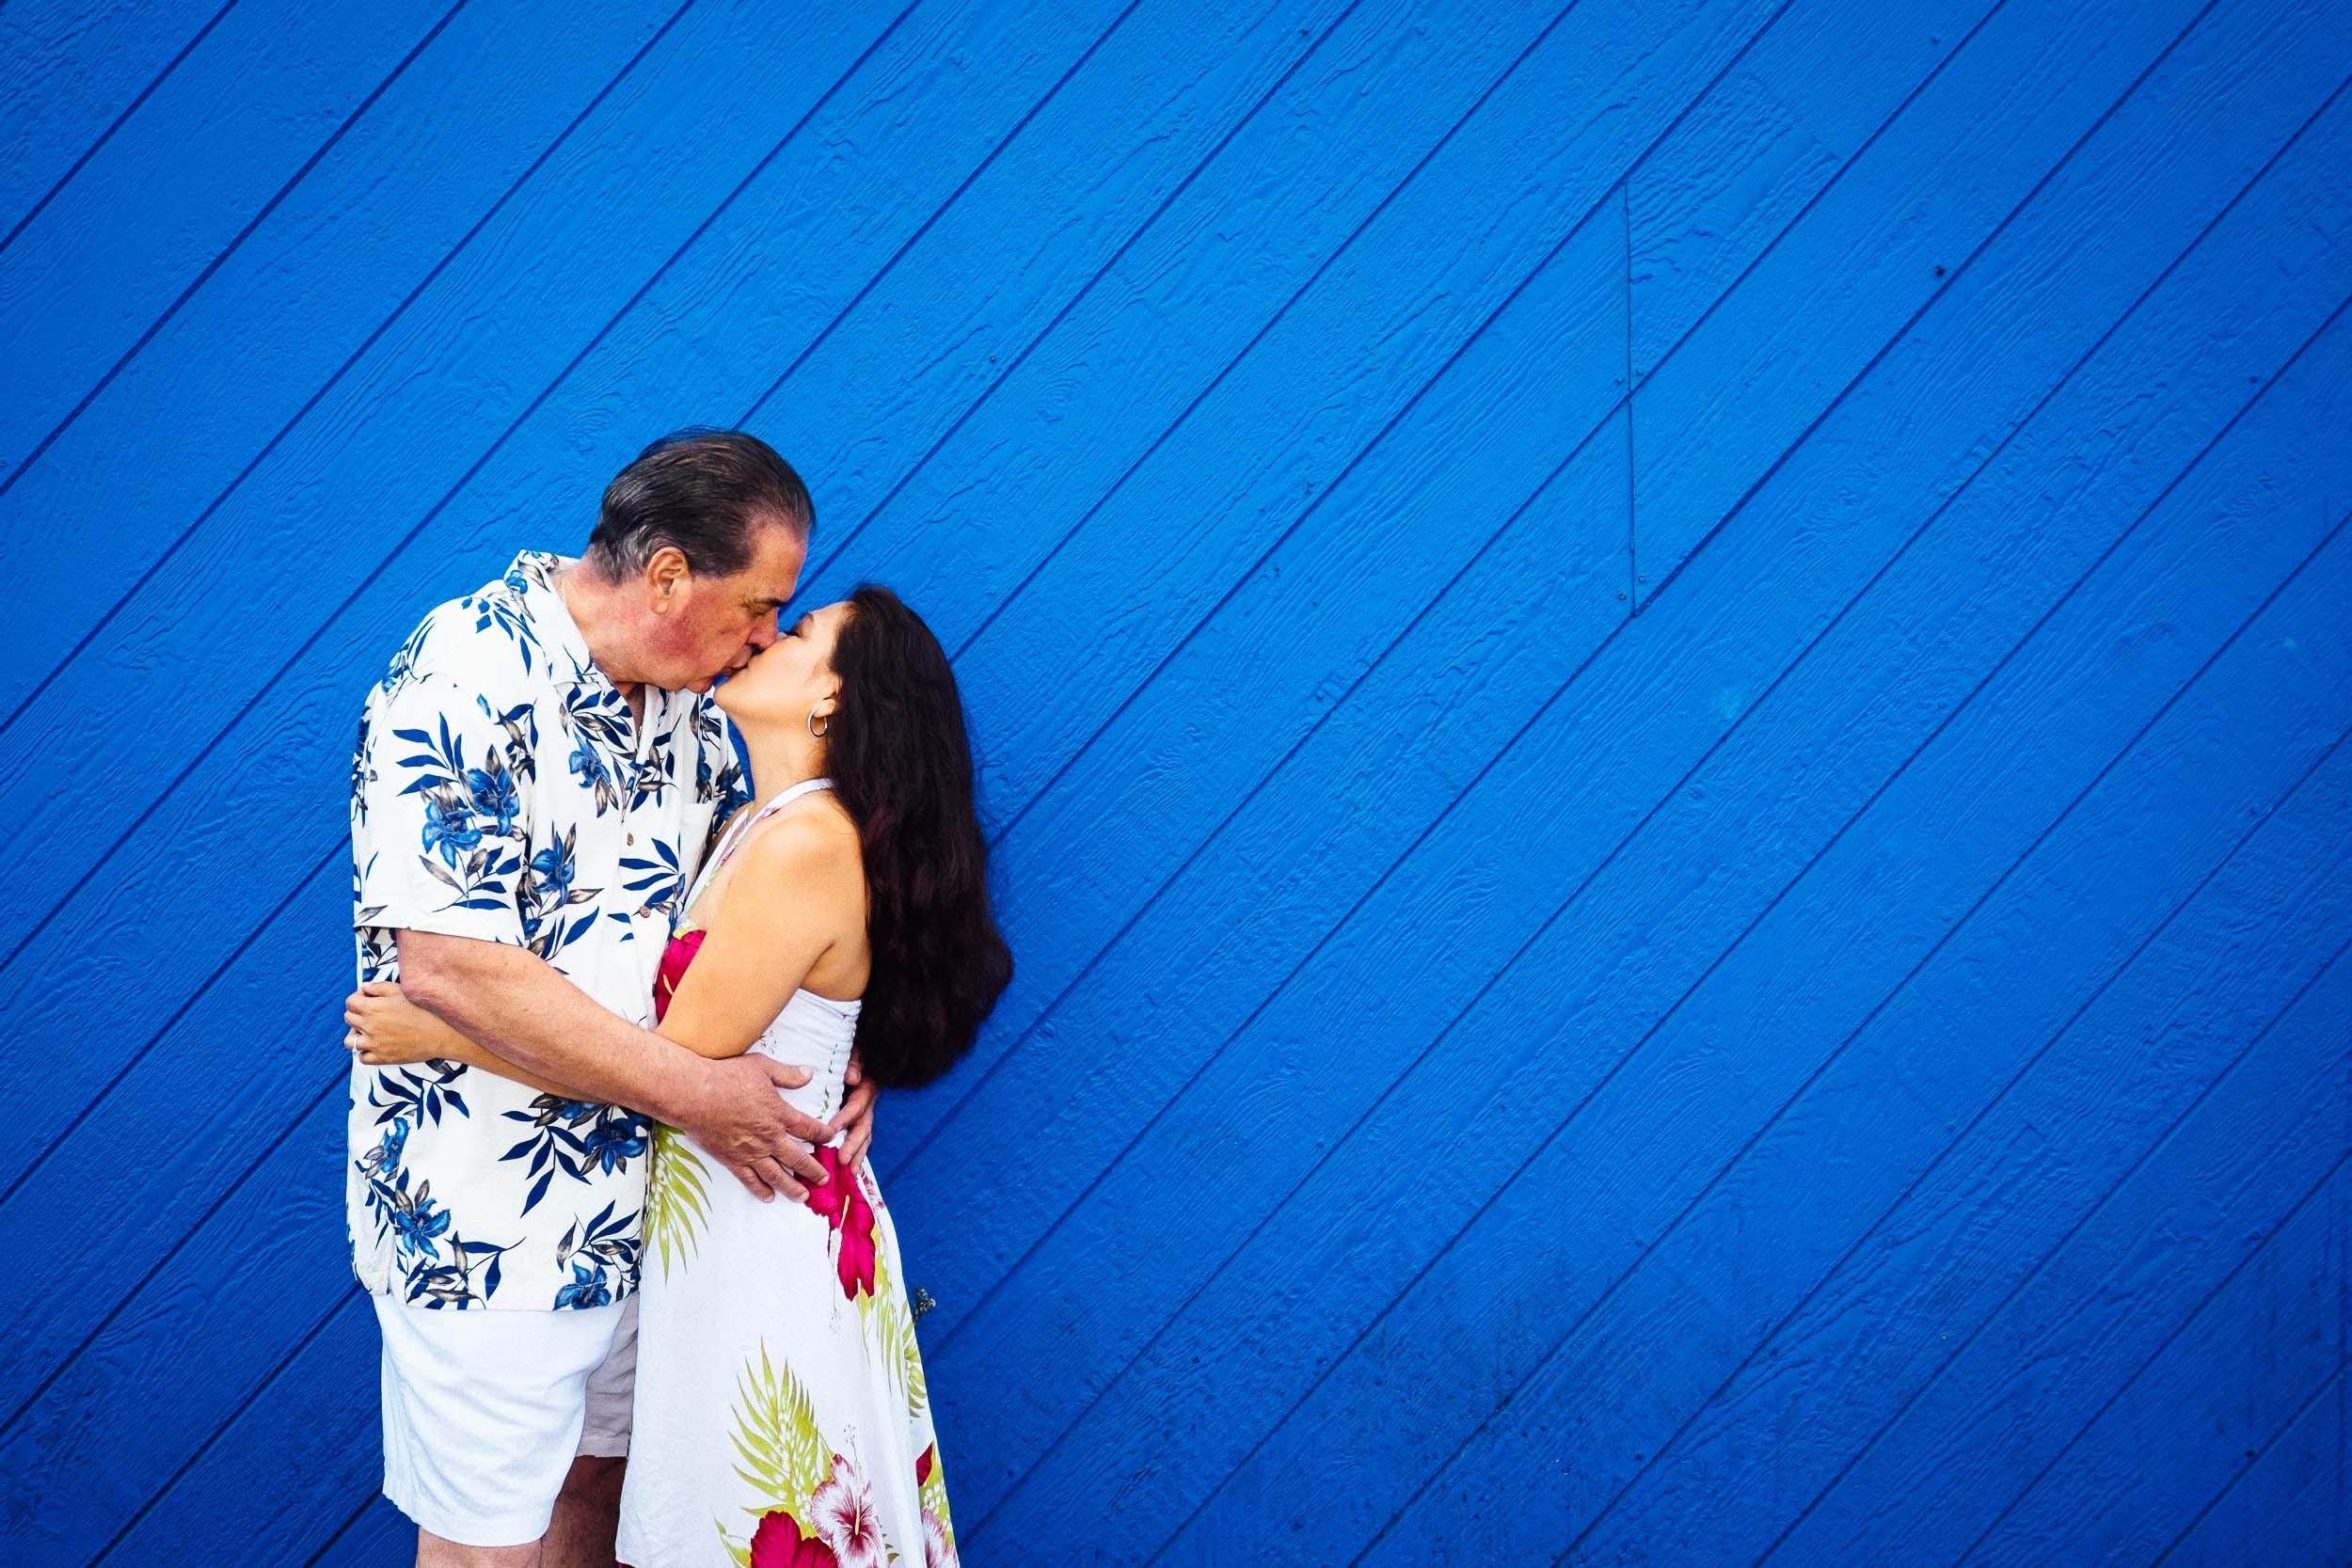 Bryan-Miraflor-Photography-Rose-Engagement-Photoshoot-20150613-0287.jpg